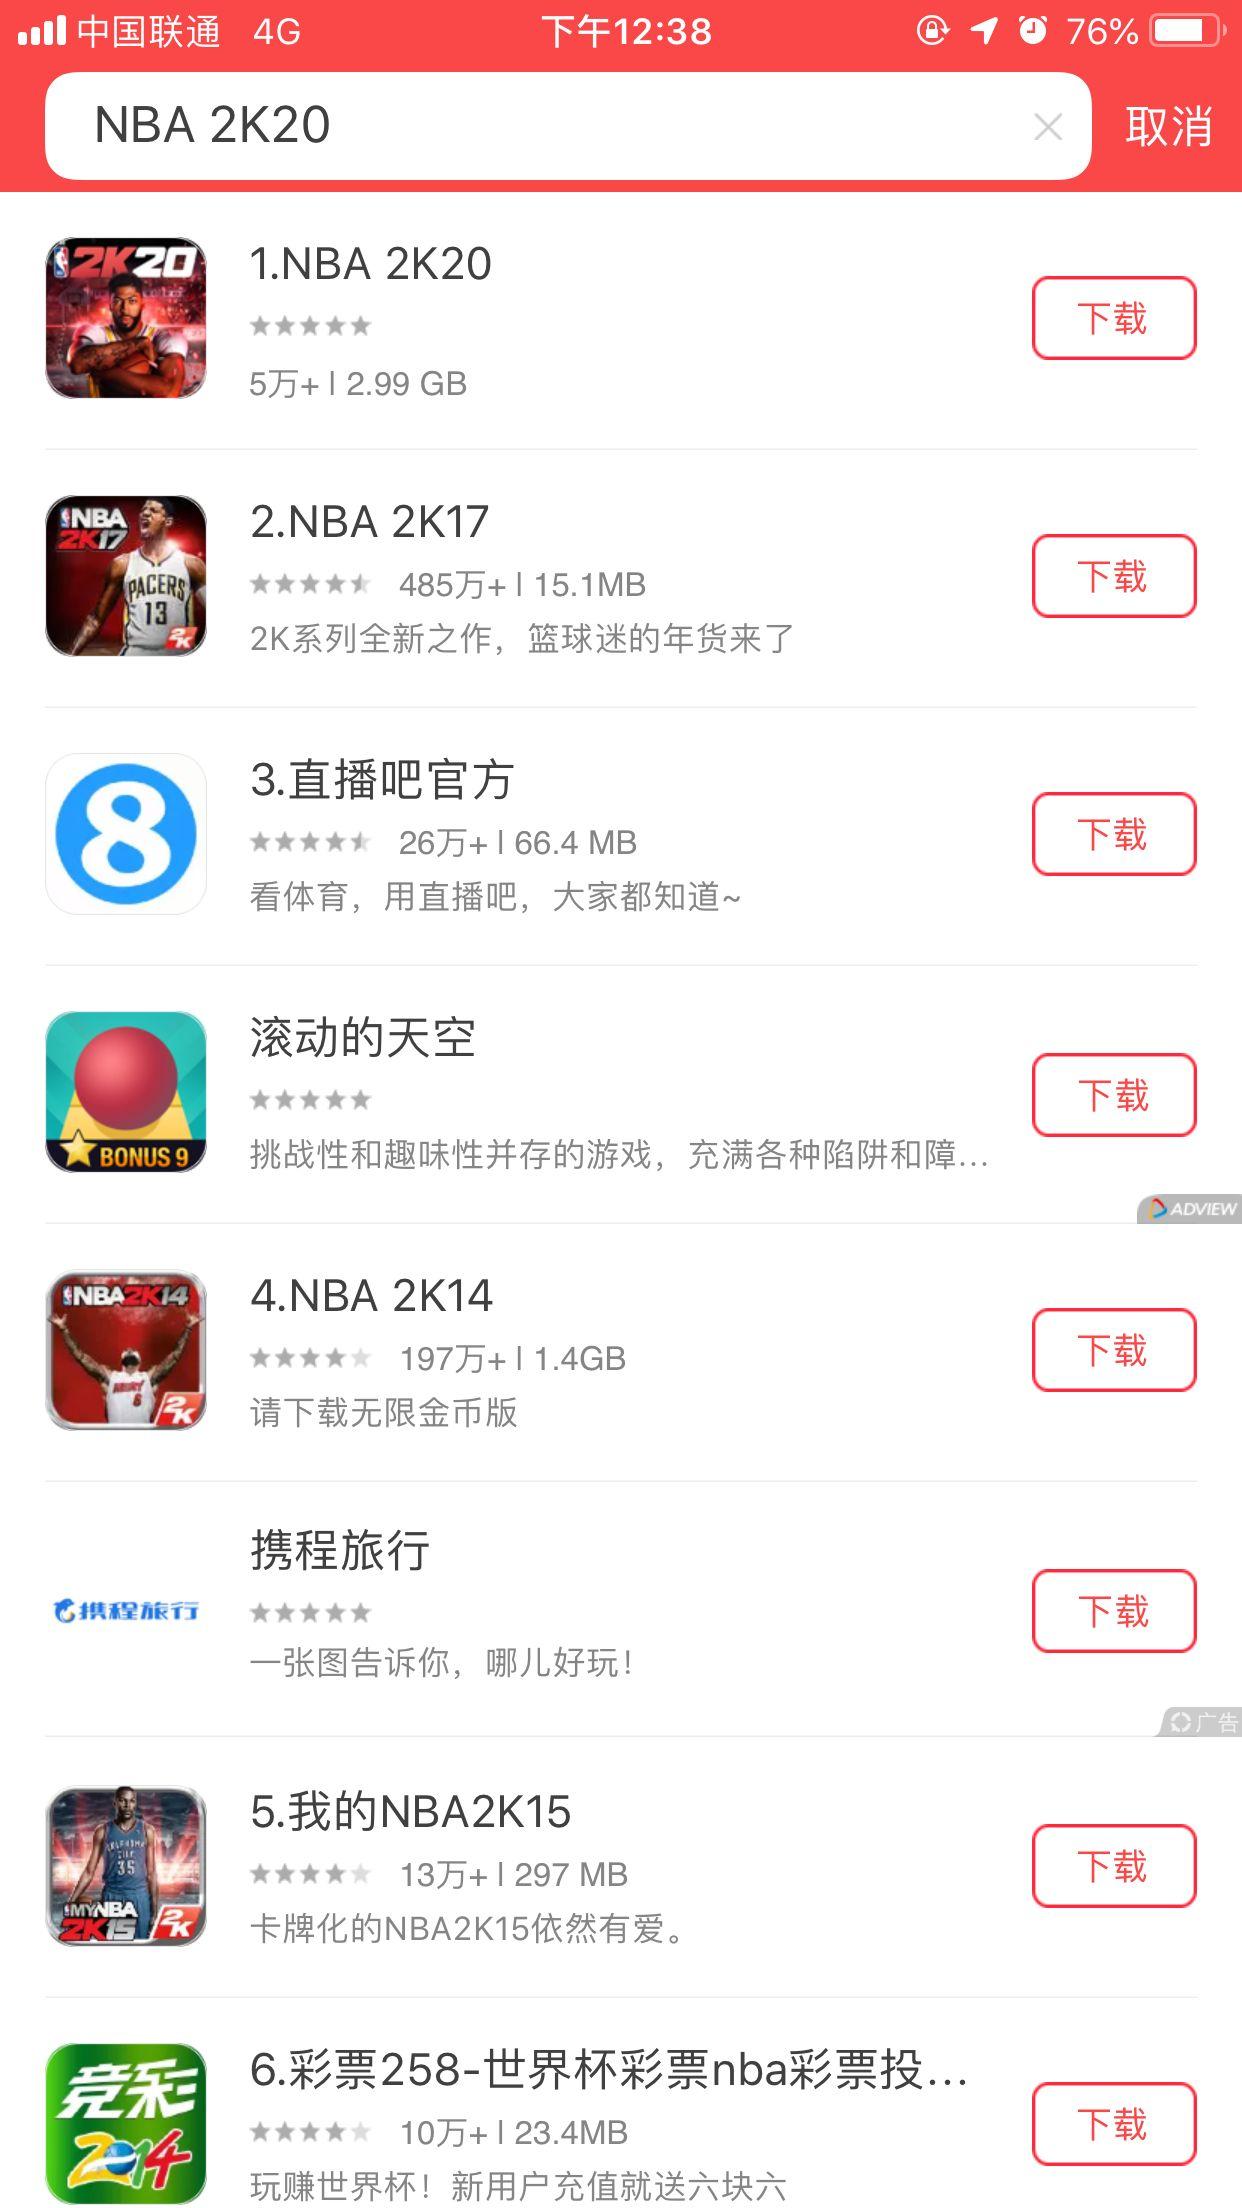 《NBA 2K20》手游苹果IOS版无需付费免费下载地址分享